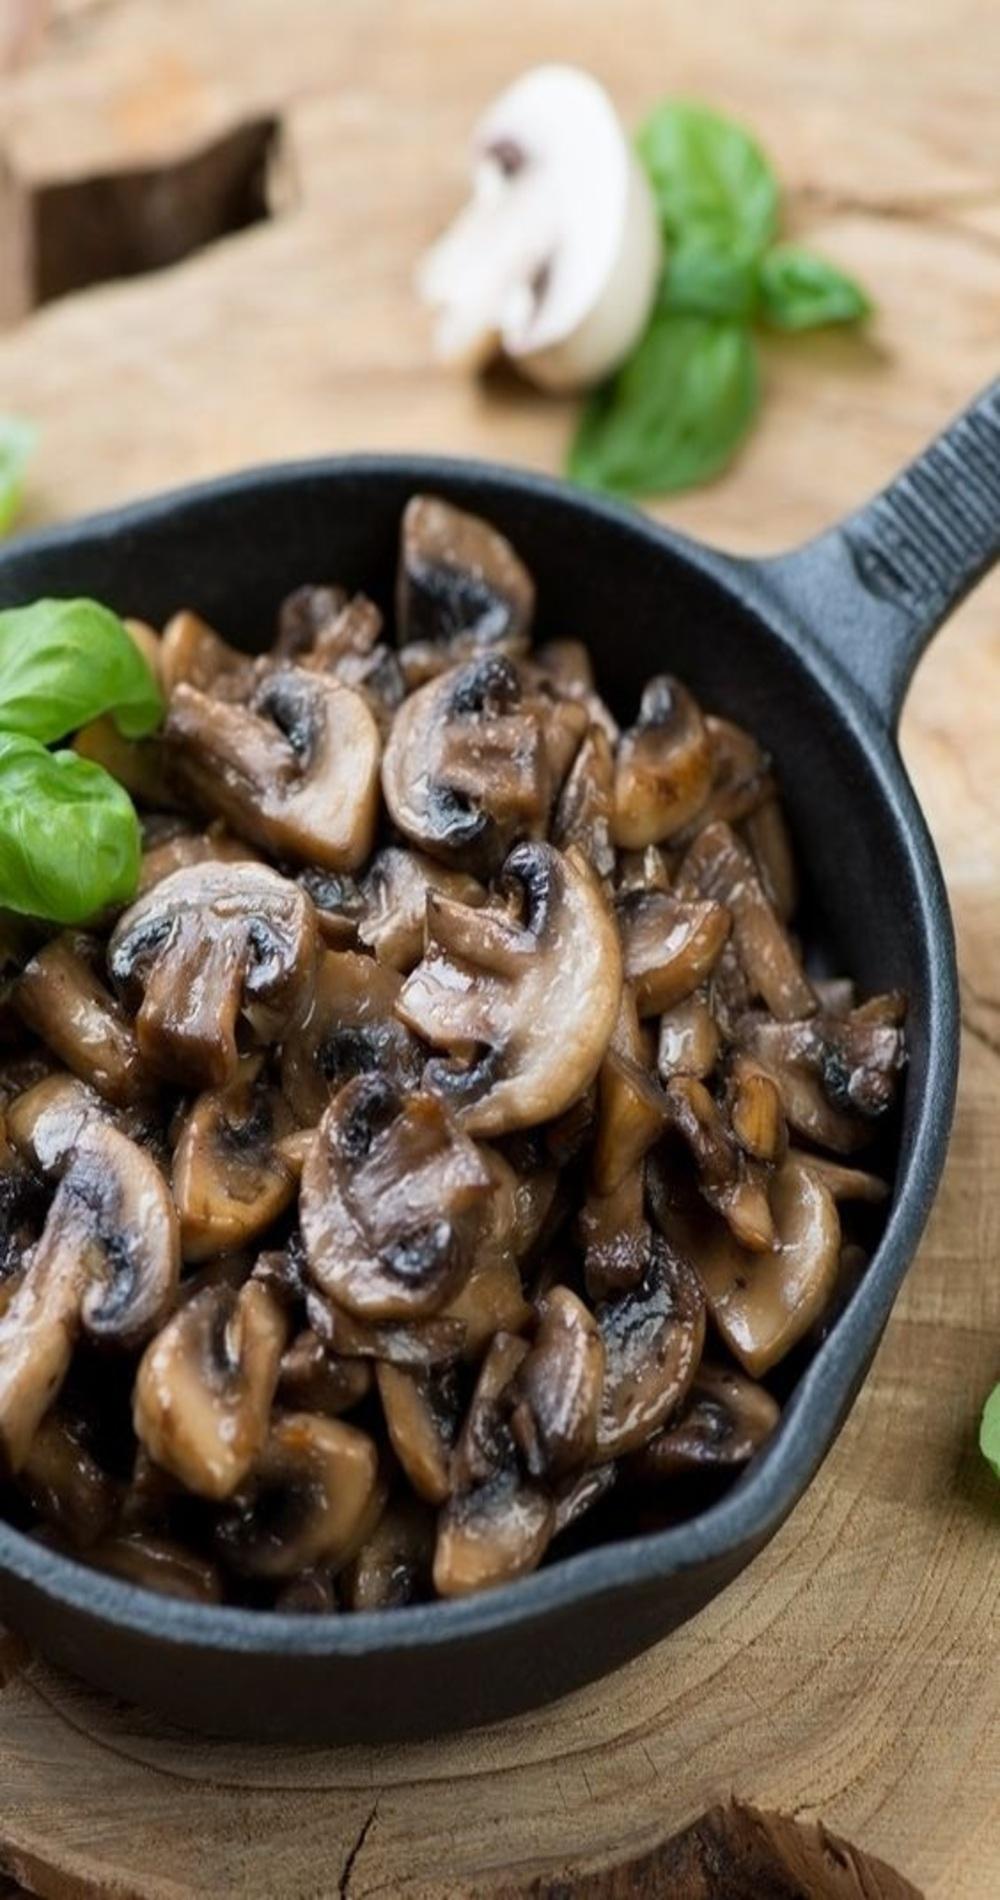 Amazing Sauteed Mushrooms